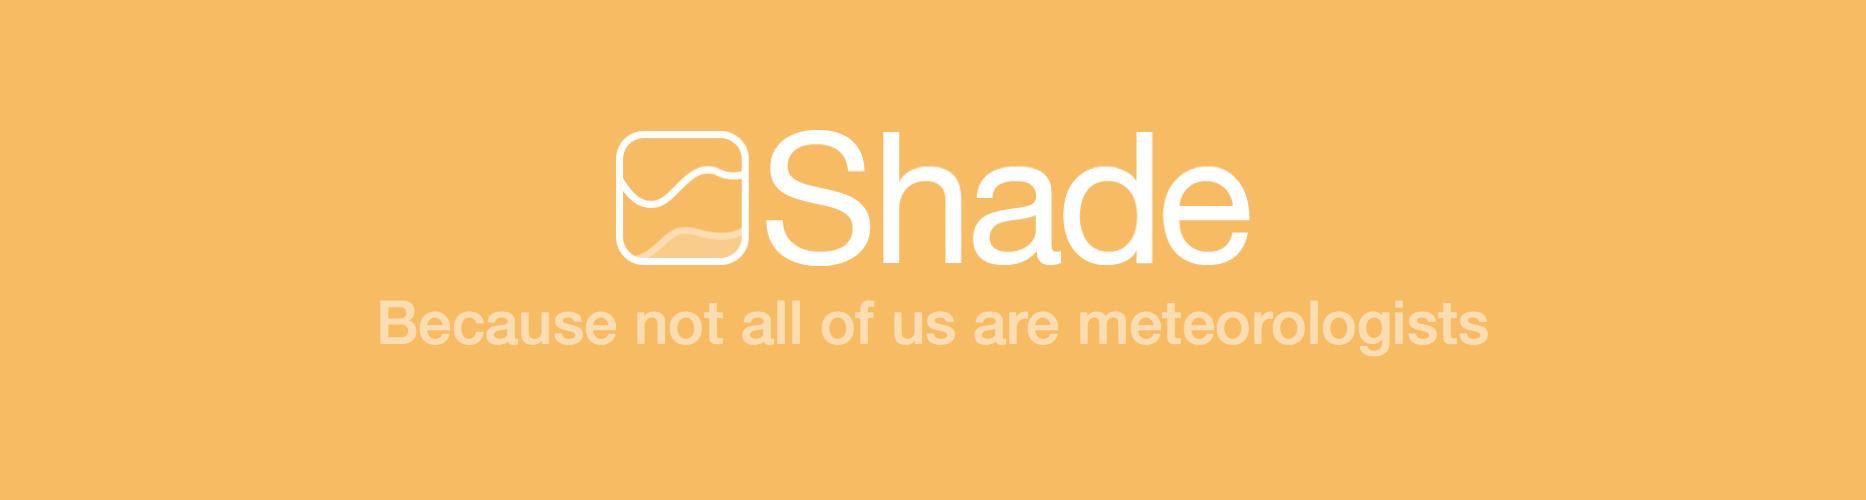 Shade for iOS 7